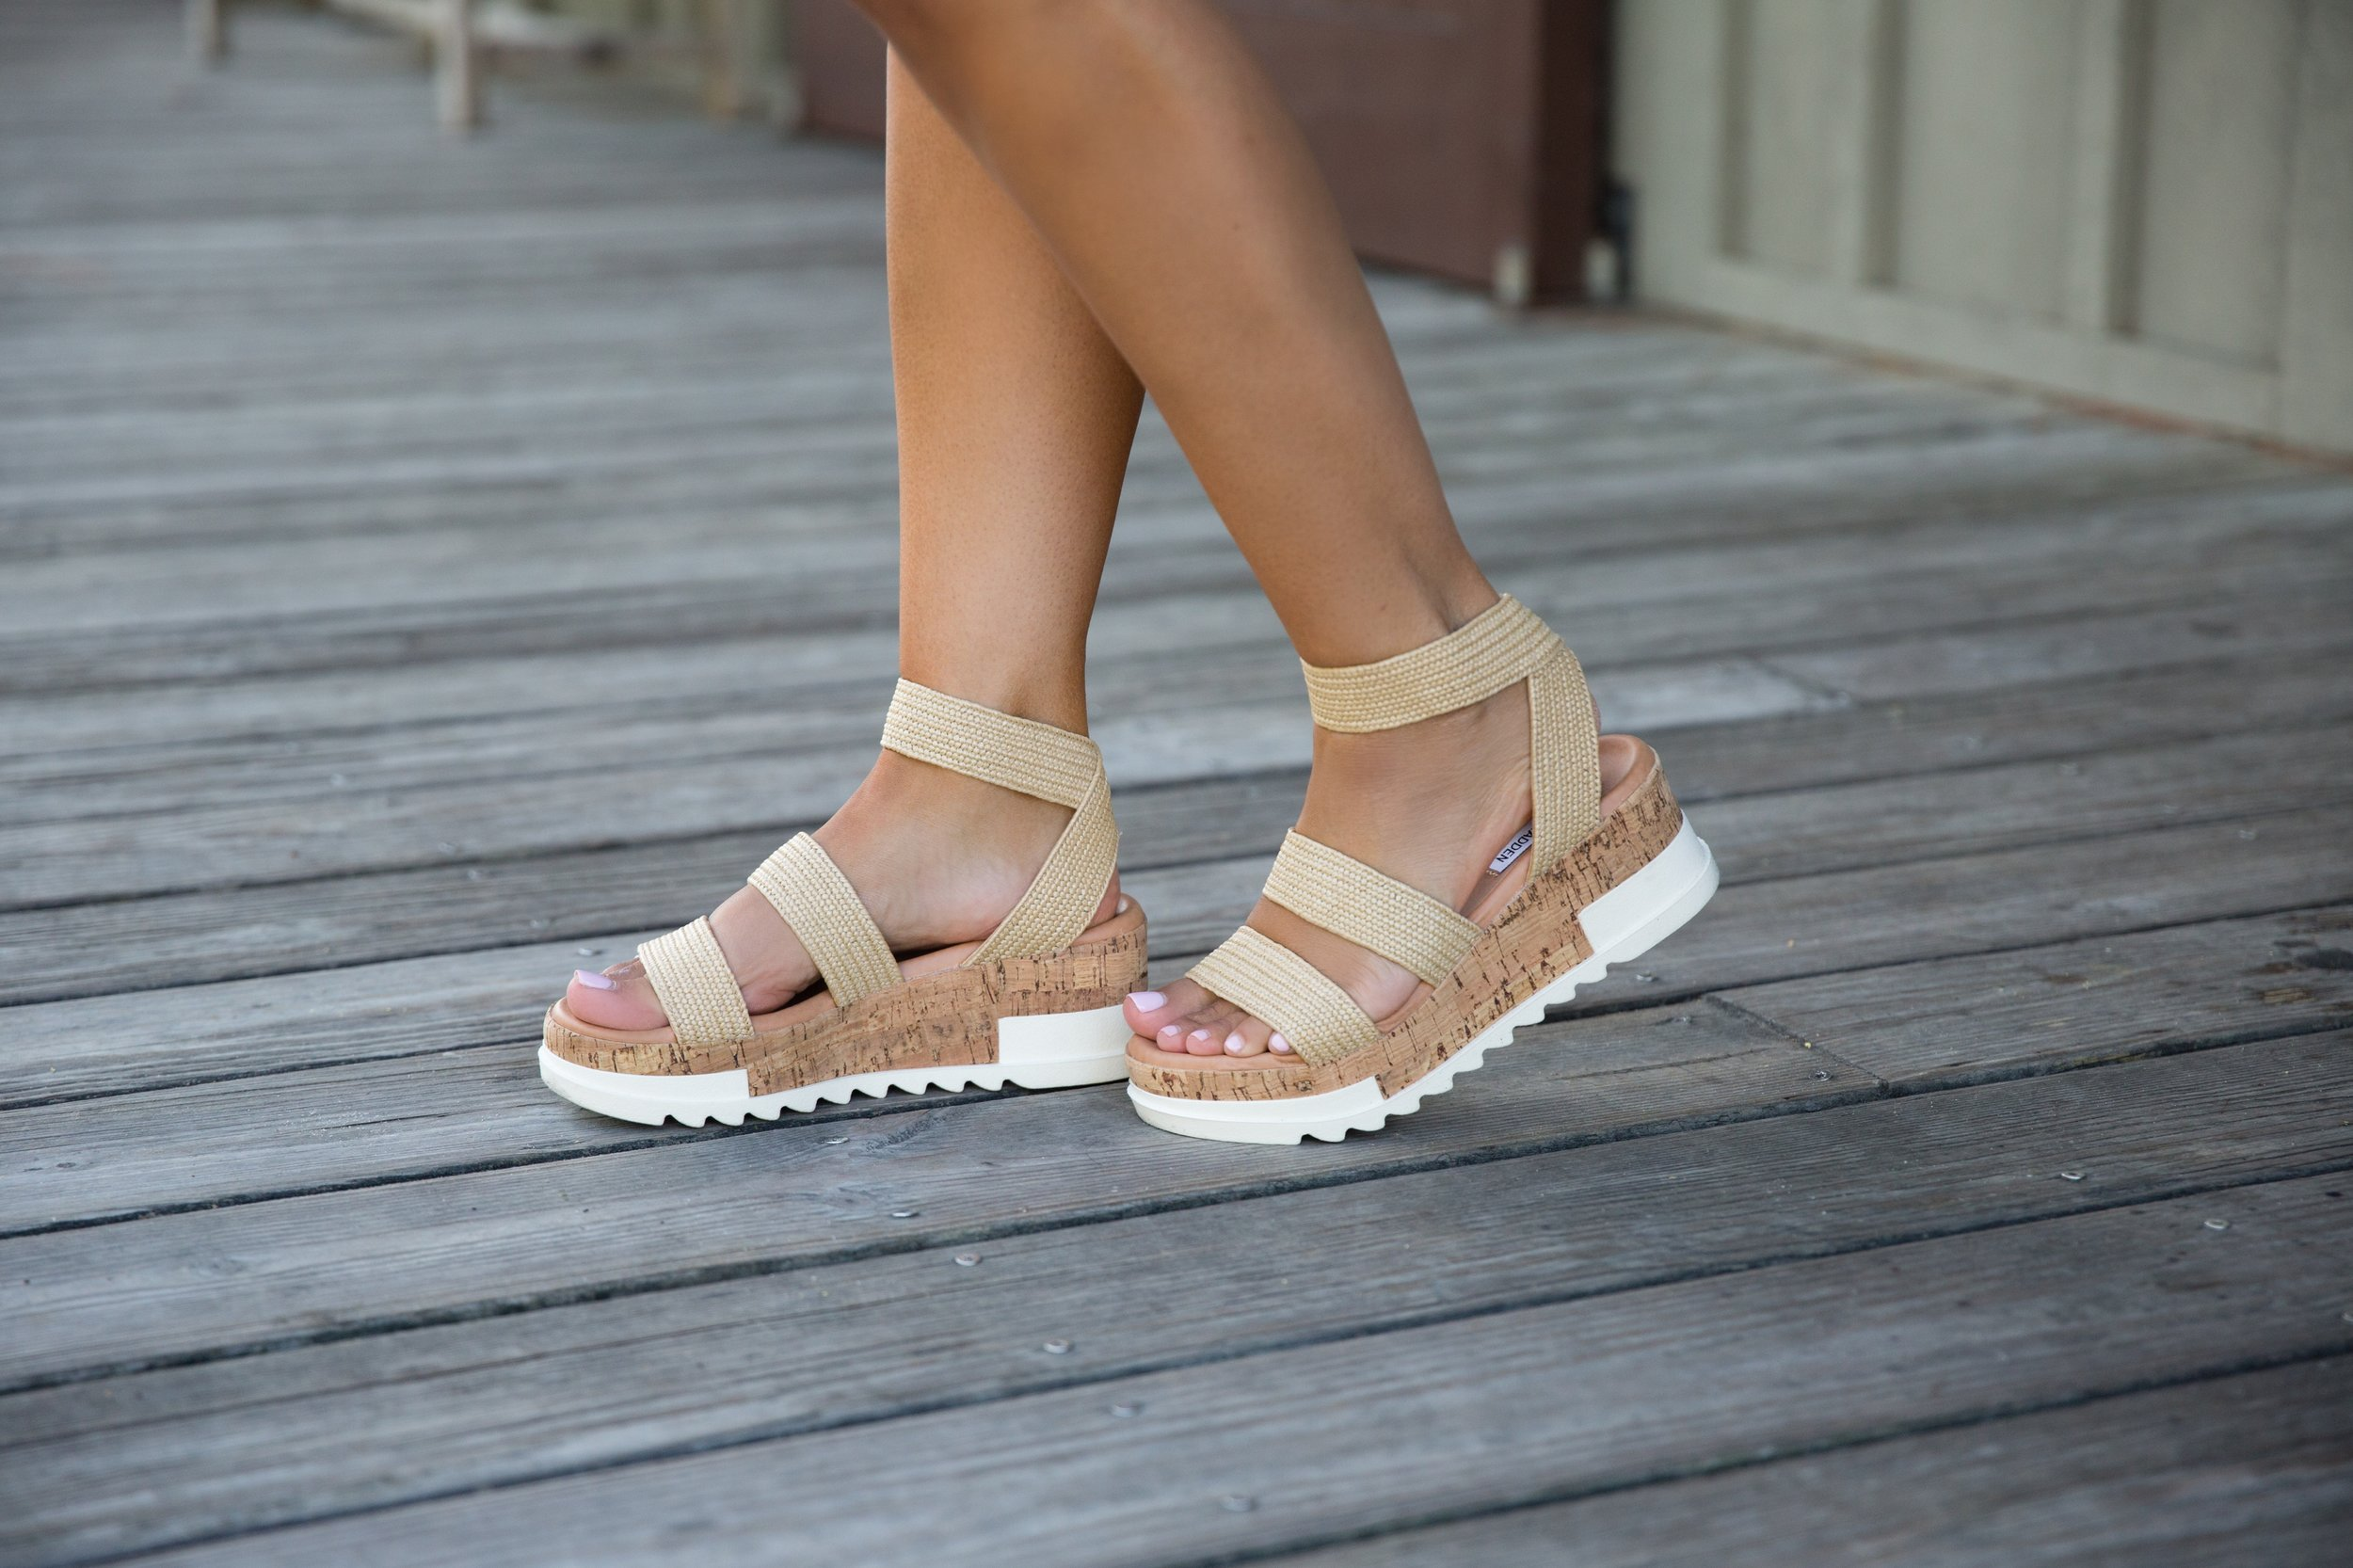 wedge sandals.JPG